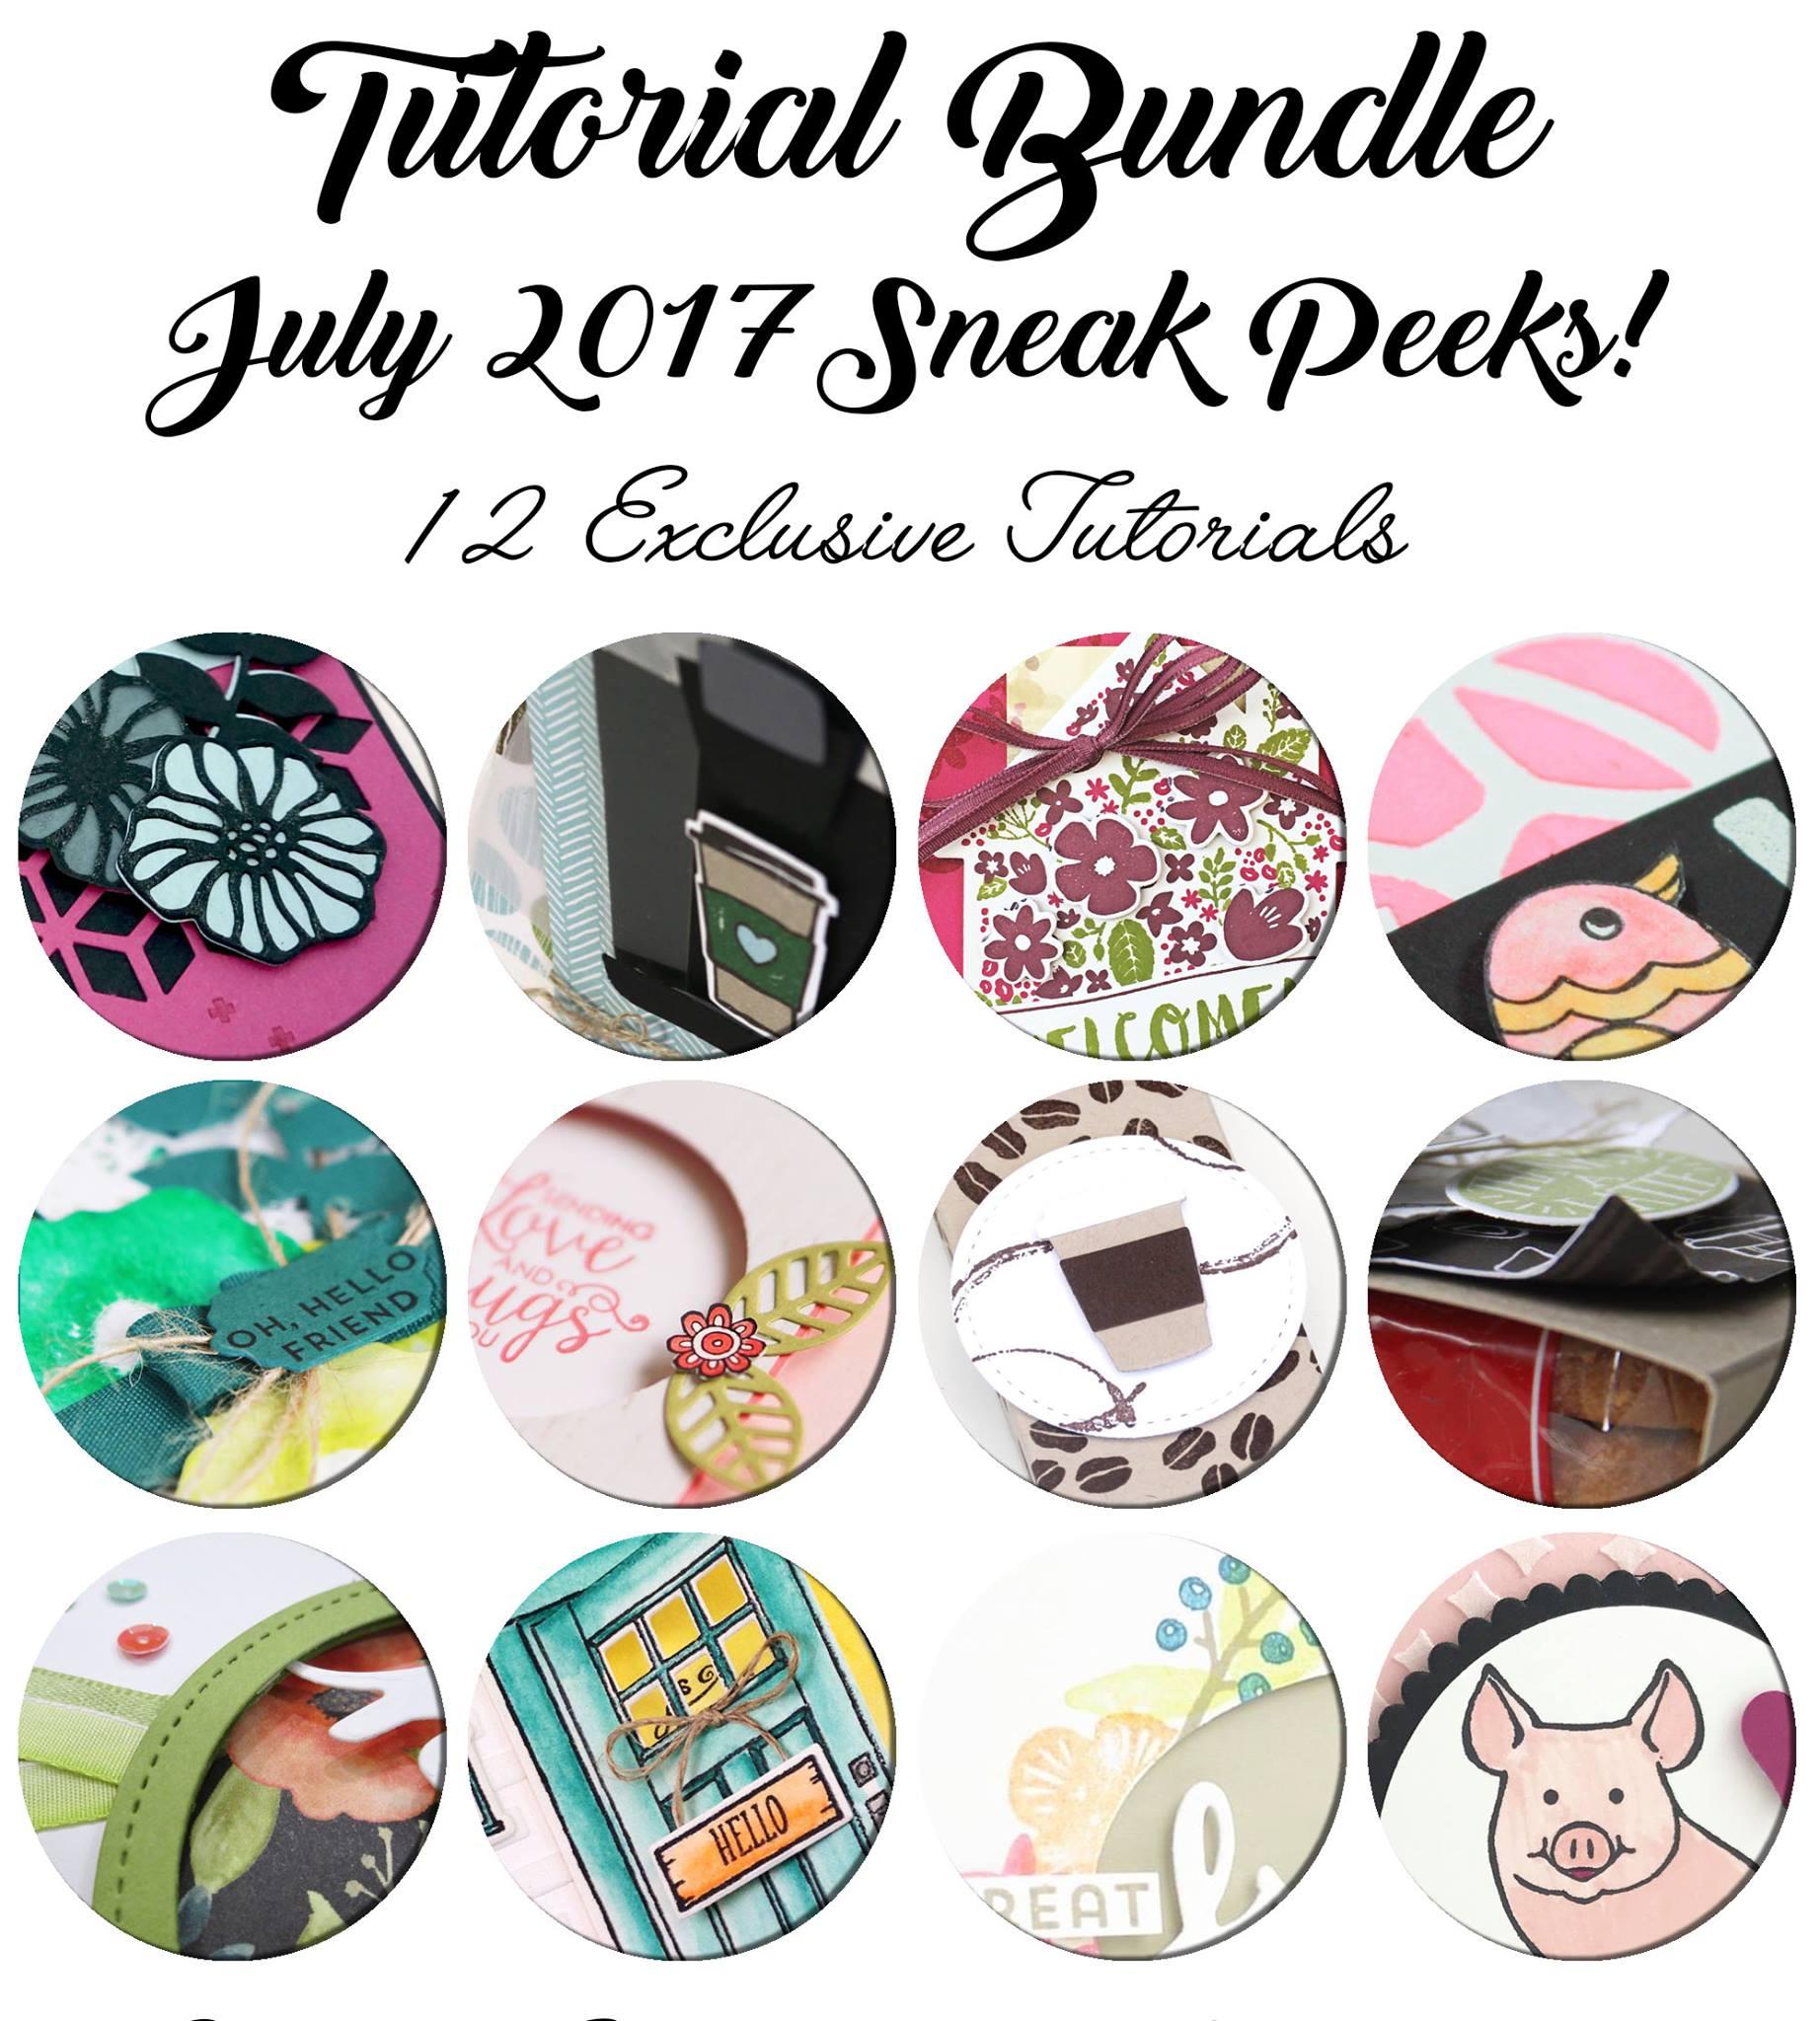 July Tutorial, Stampin' Up!